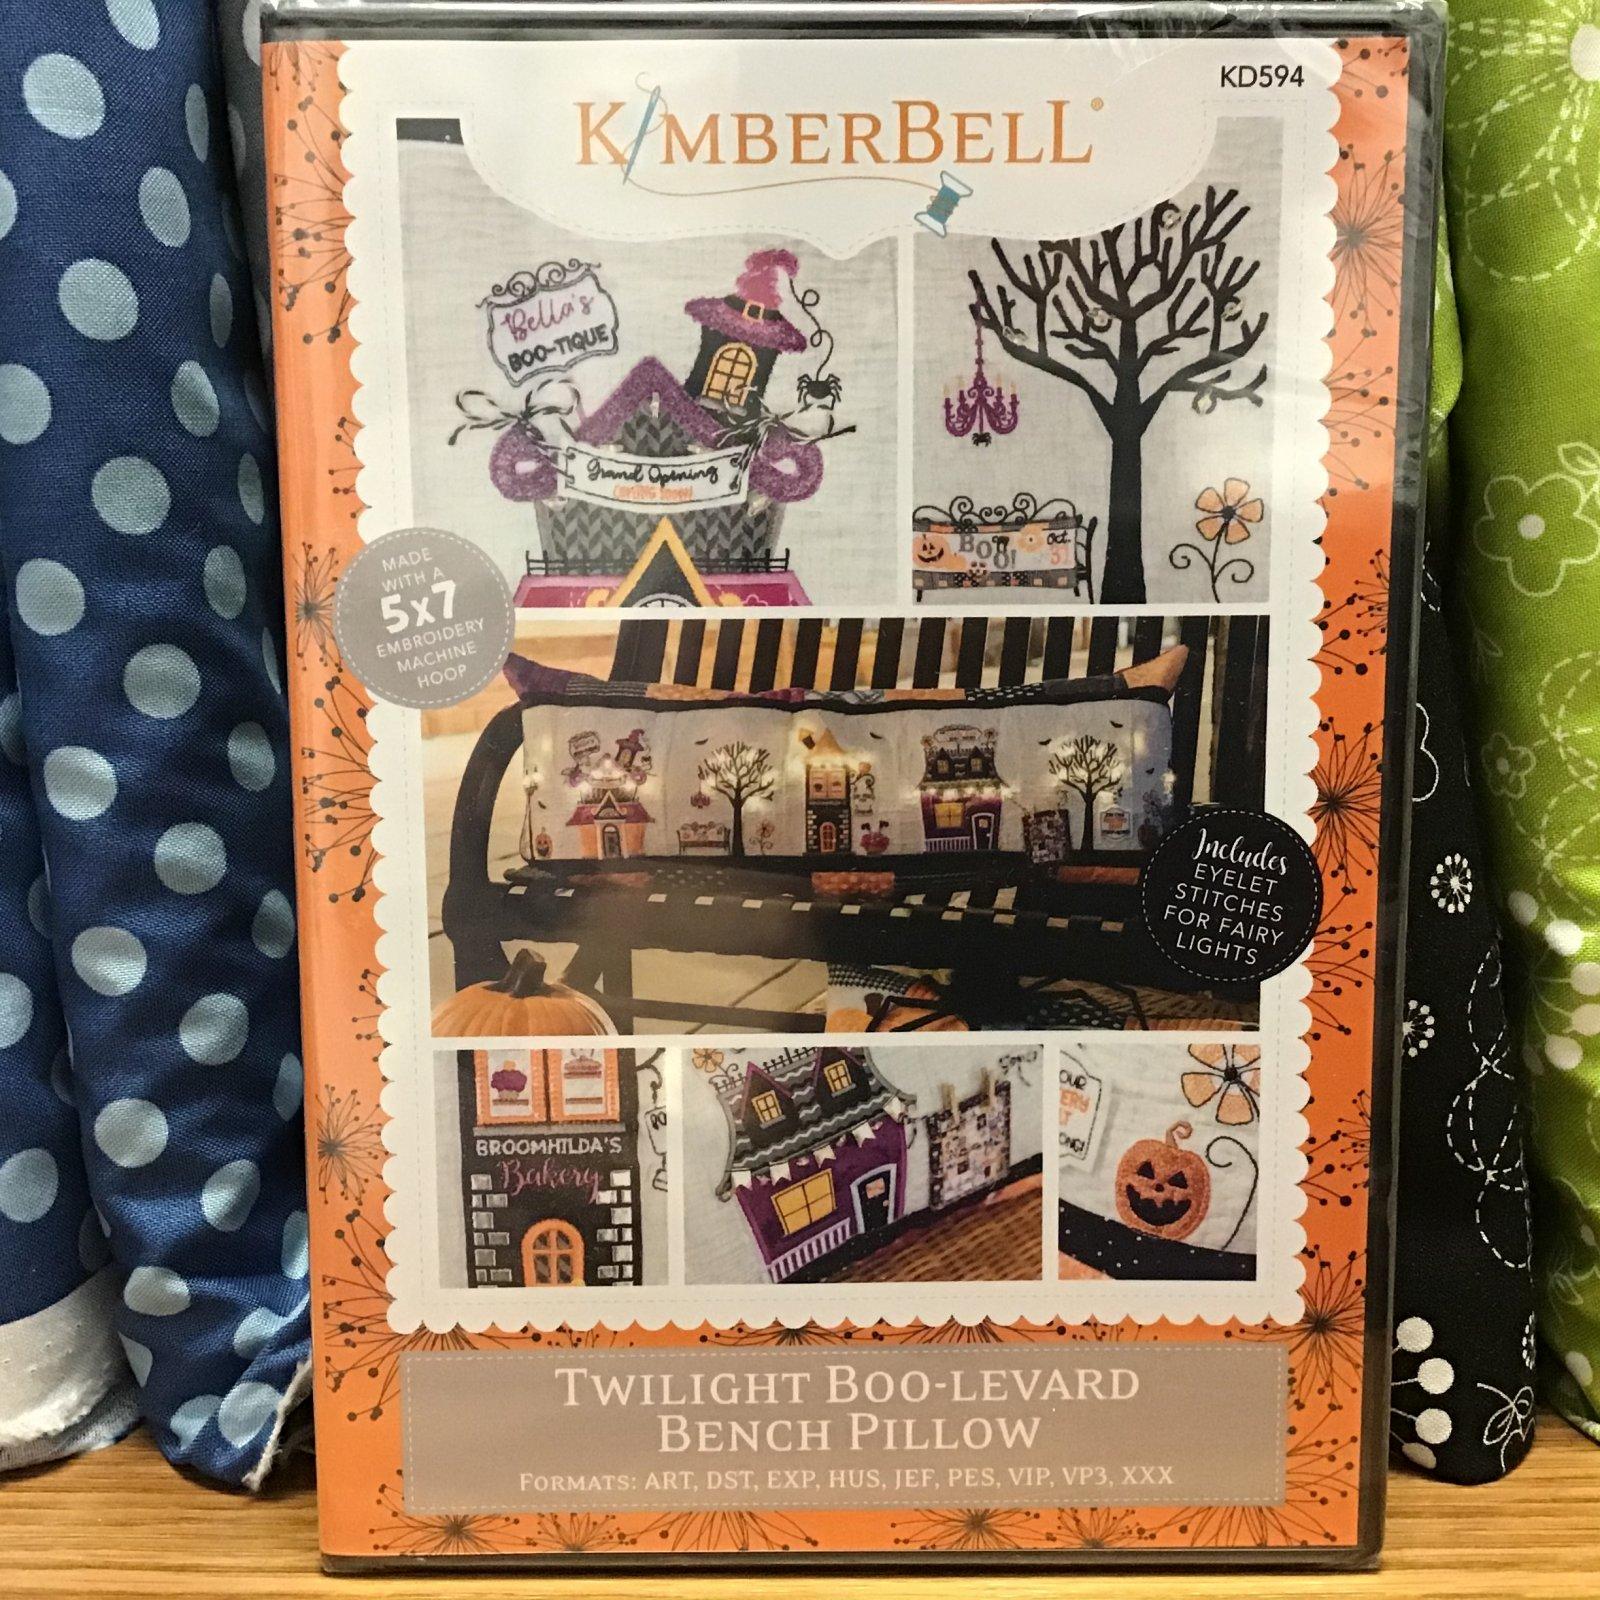 Kimberbell ME CD Bench Buddy Twilight Boo-levard